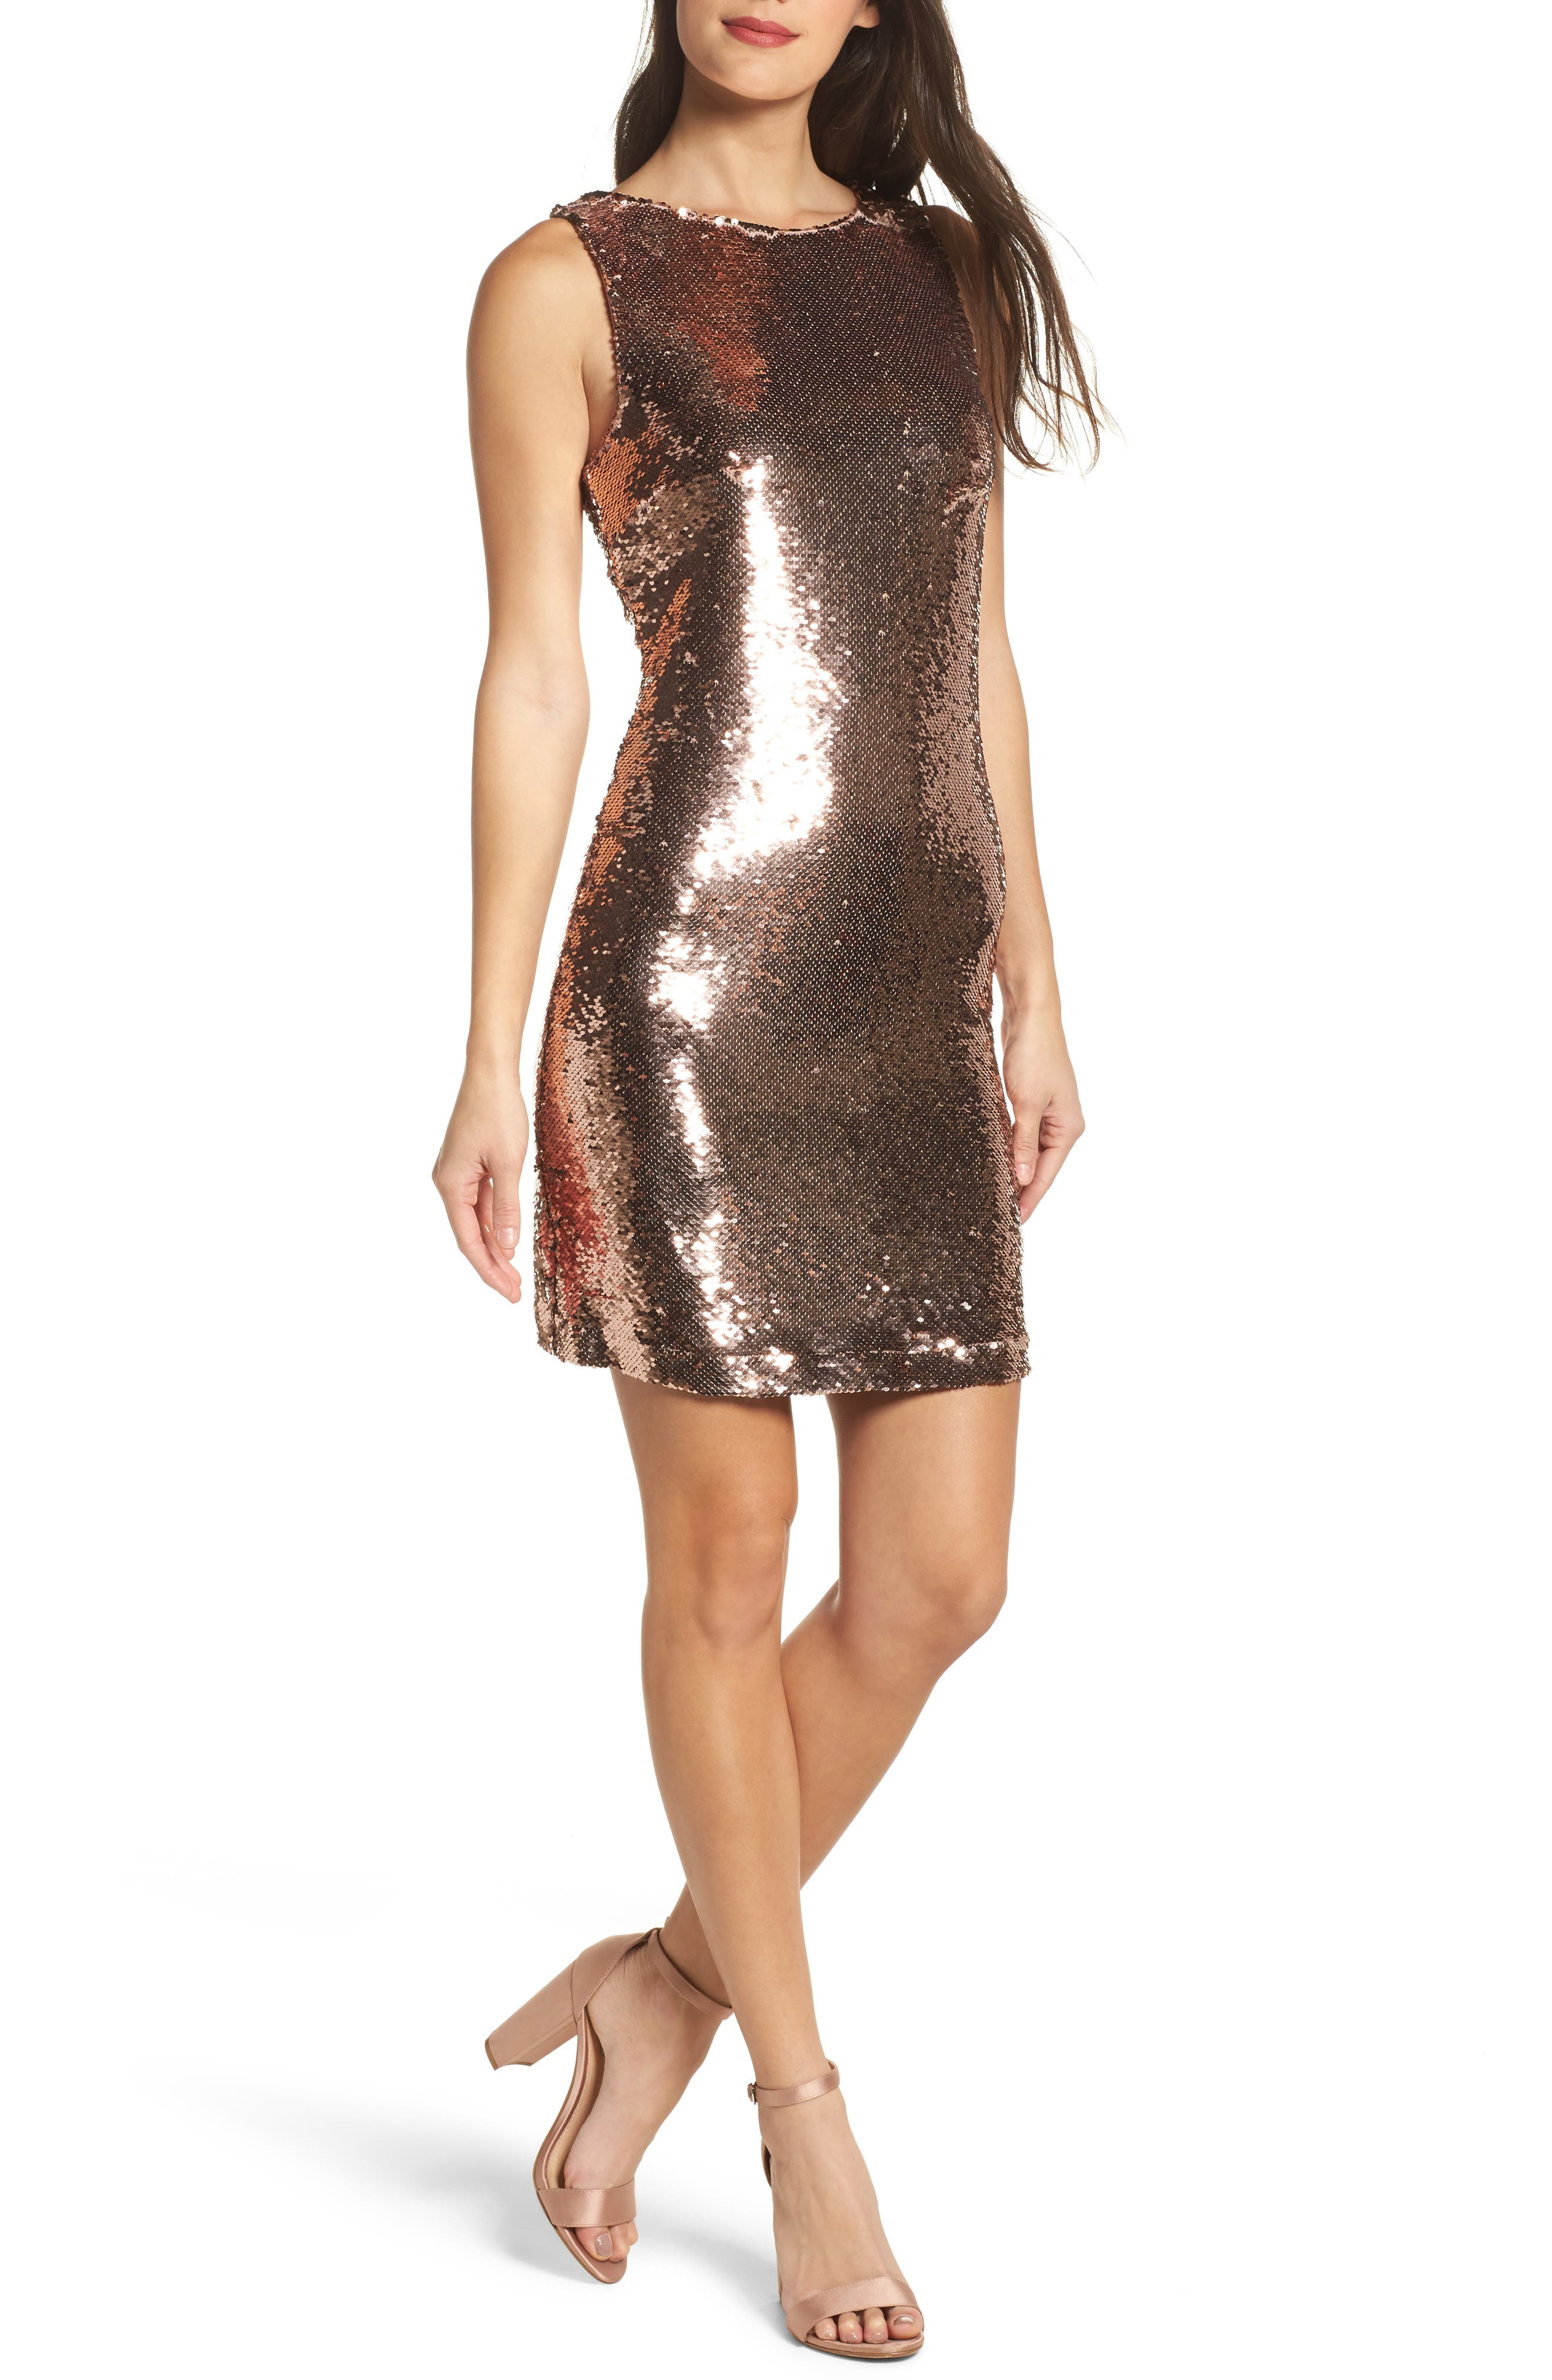 Garland Sequin Sheath Dress,                             Main thumbnail 1, color,                             Rose Gold